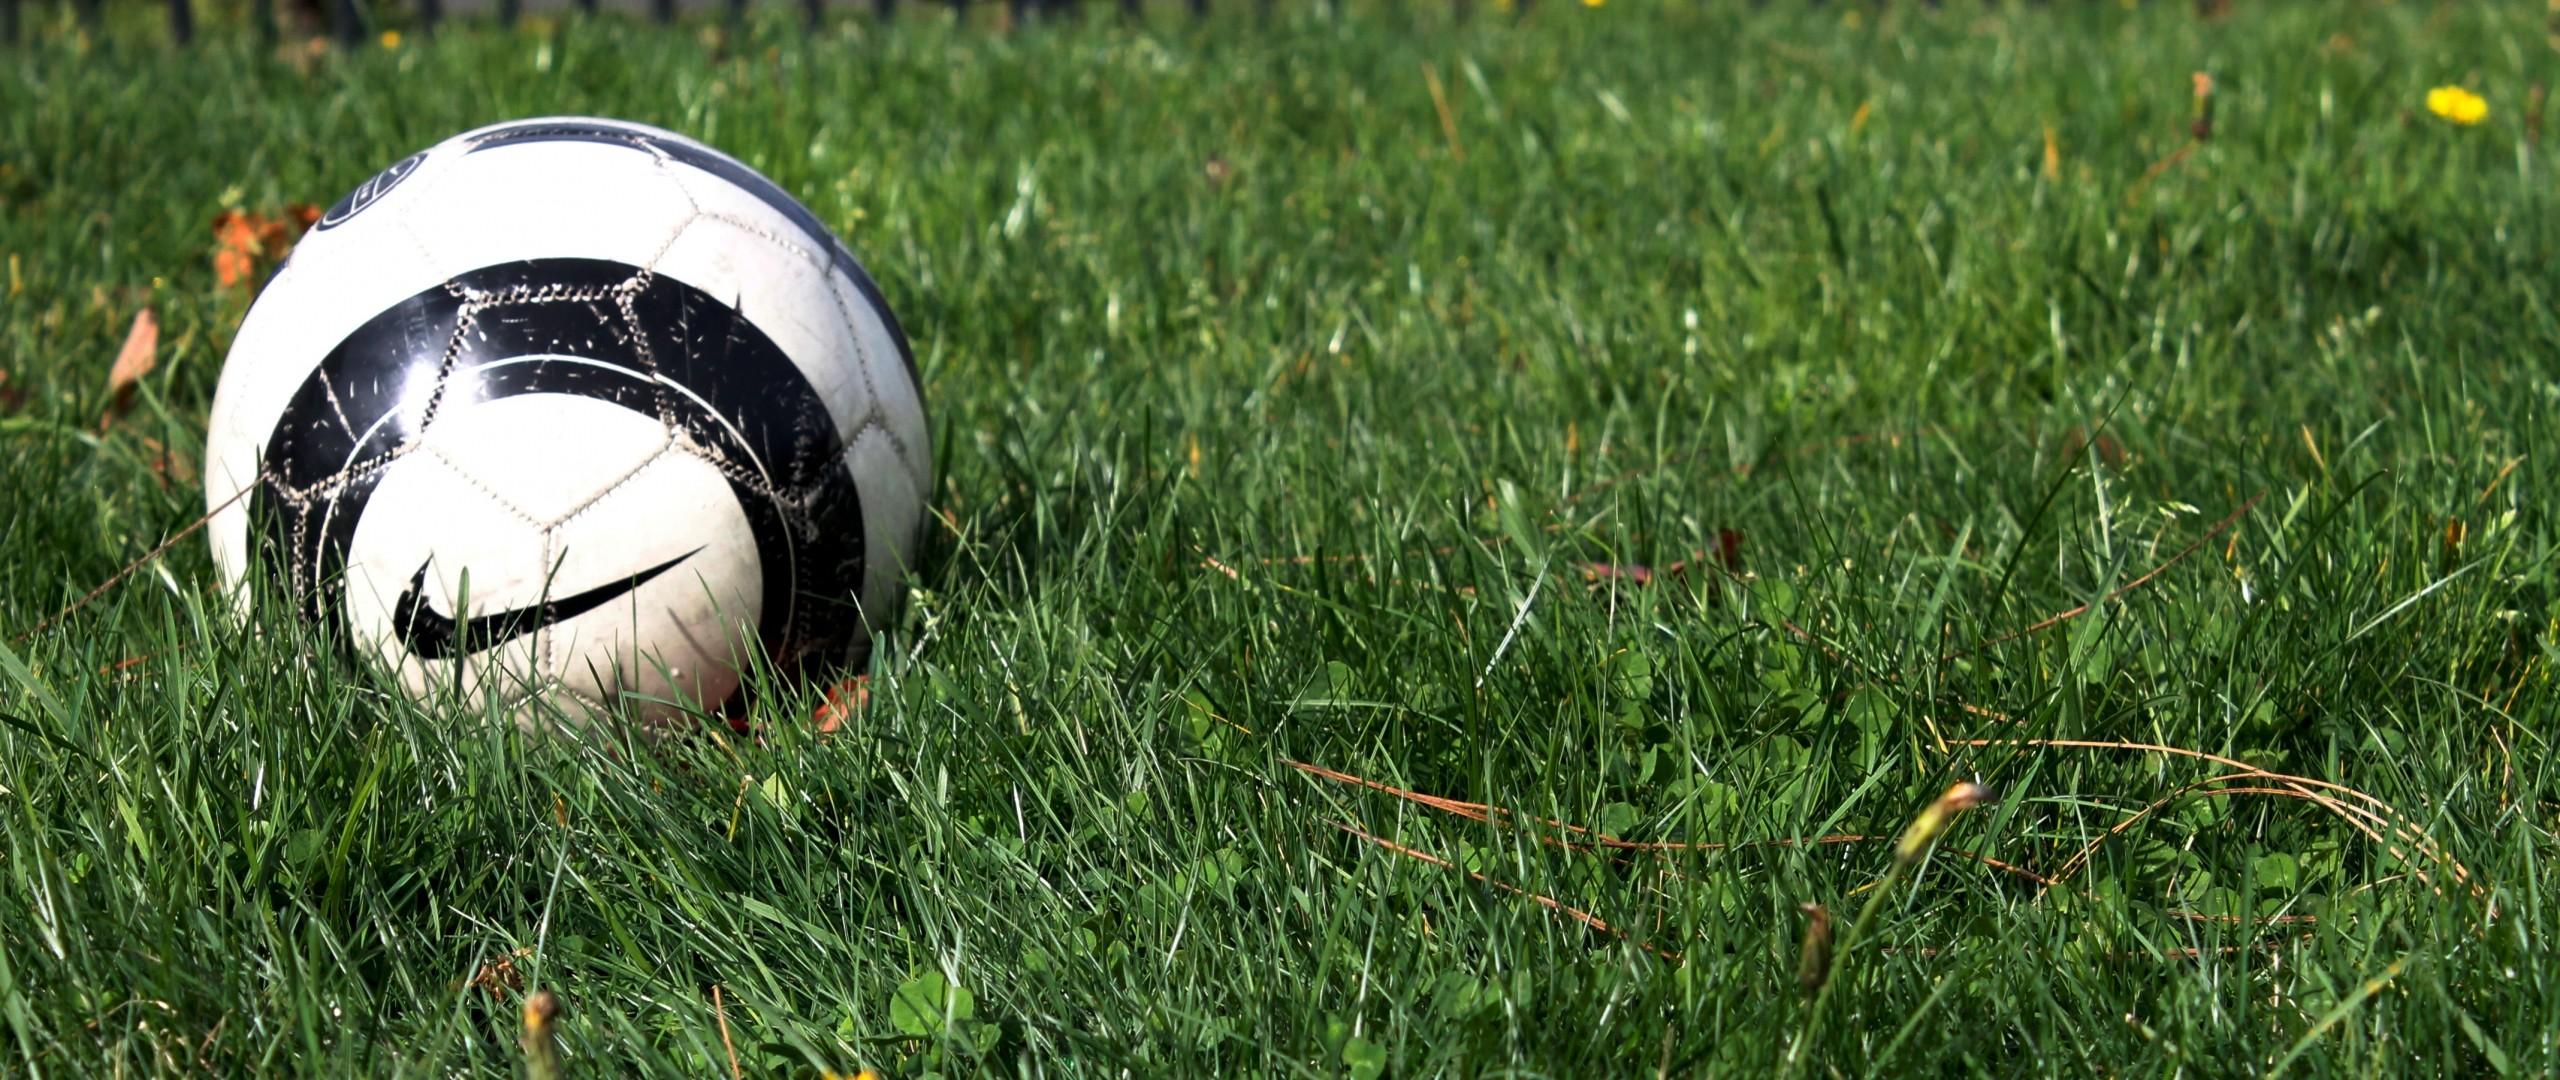 Wallpaper soccer ball, nike, grass